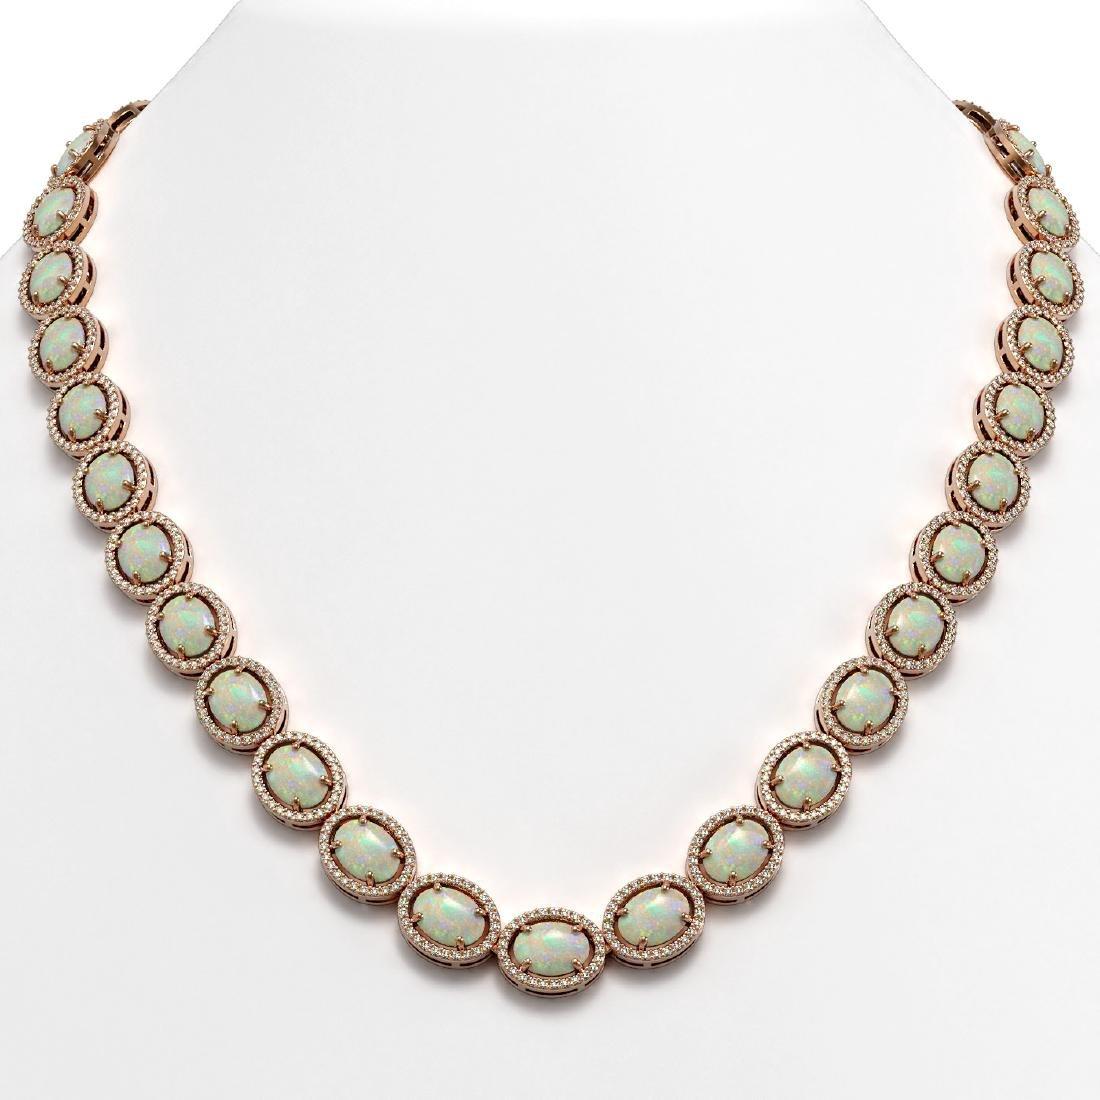 42.29 CTW Opal & Diamond Necklace Rose Gold 10K Rose